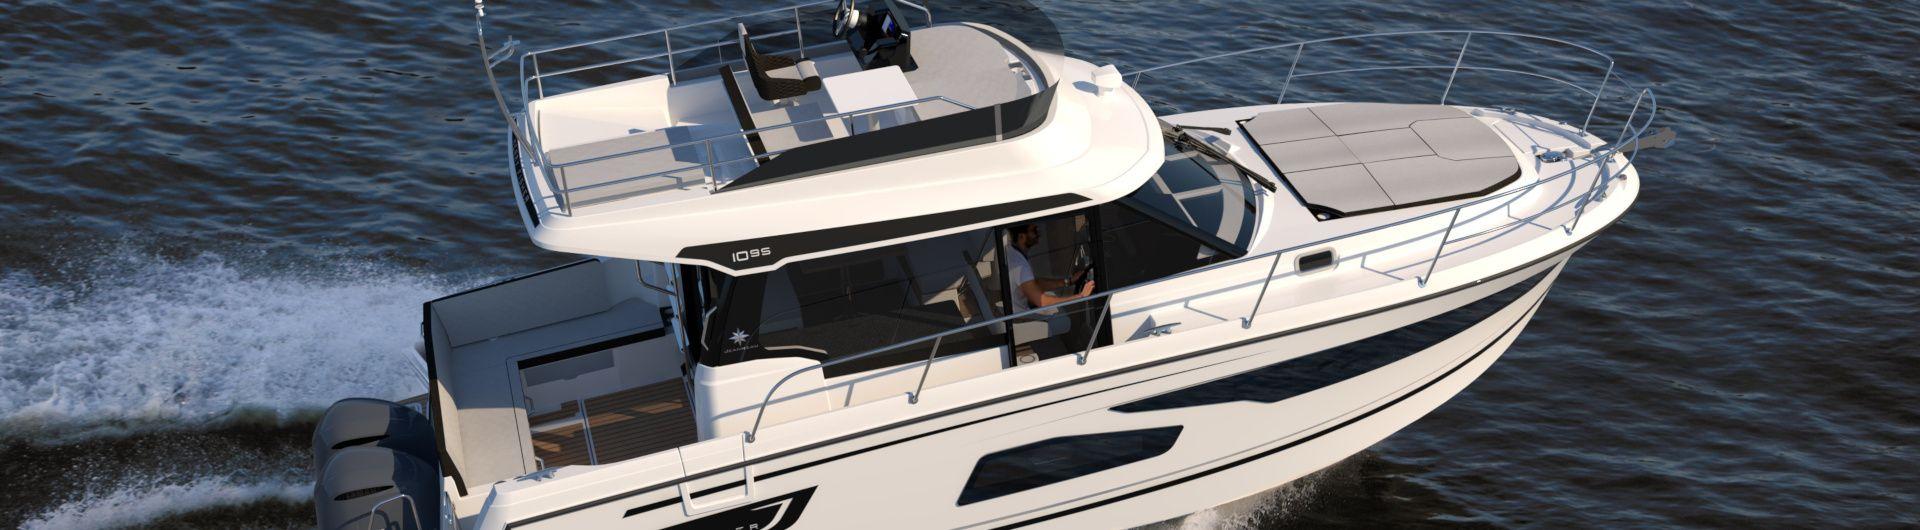 Sportboot Jeanneau Merry Fisher 1095FLY header